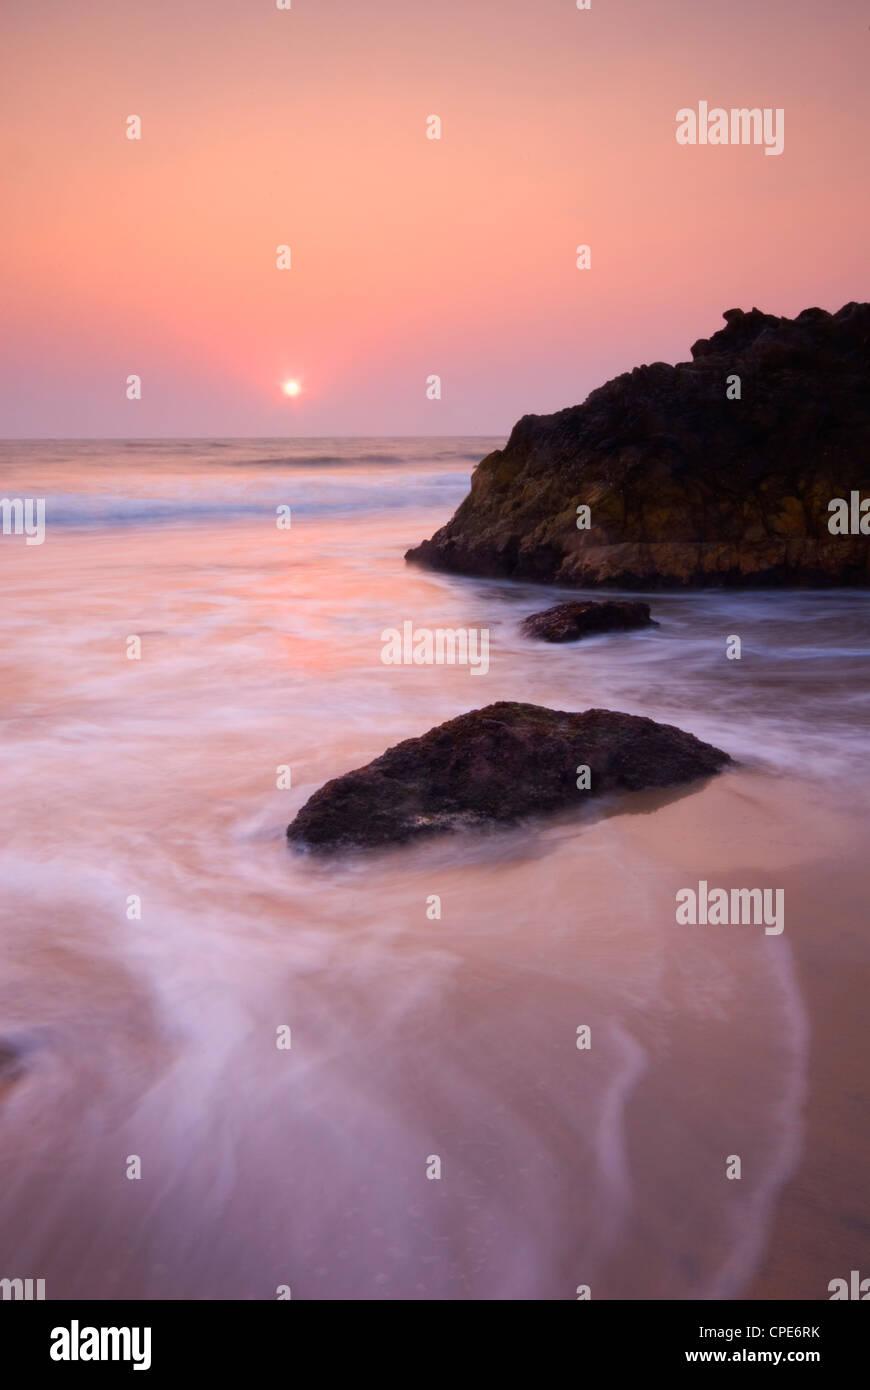 Arambol Beach, Goa, India, Asia - Stock Image